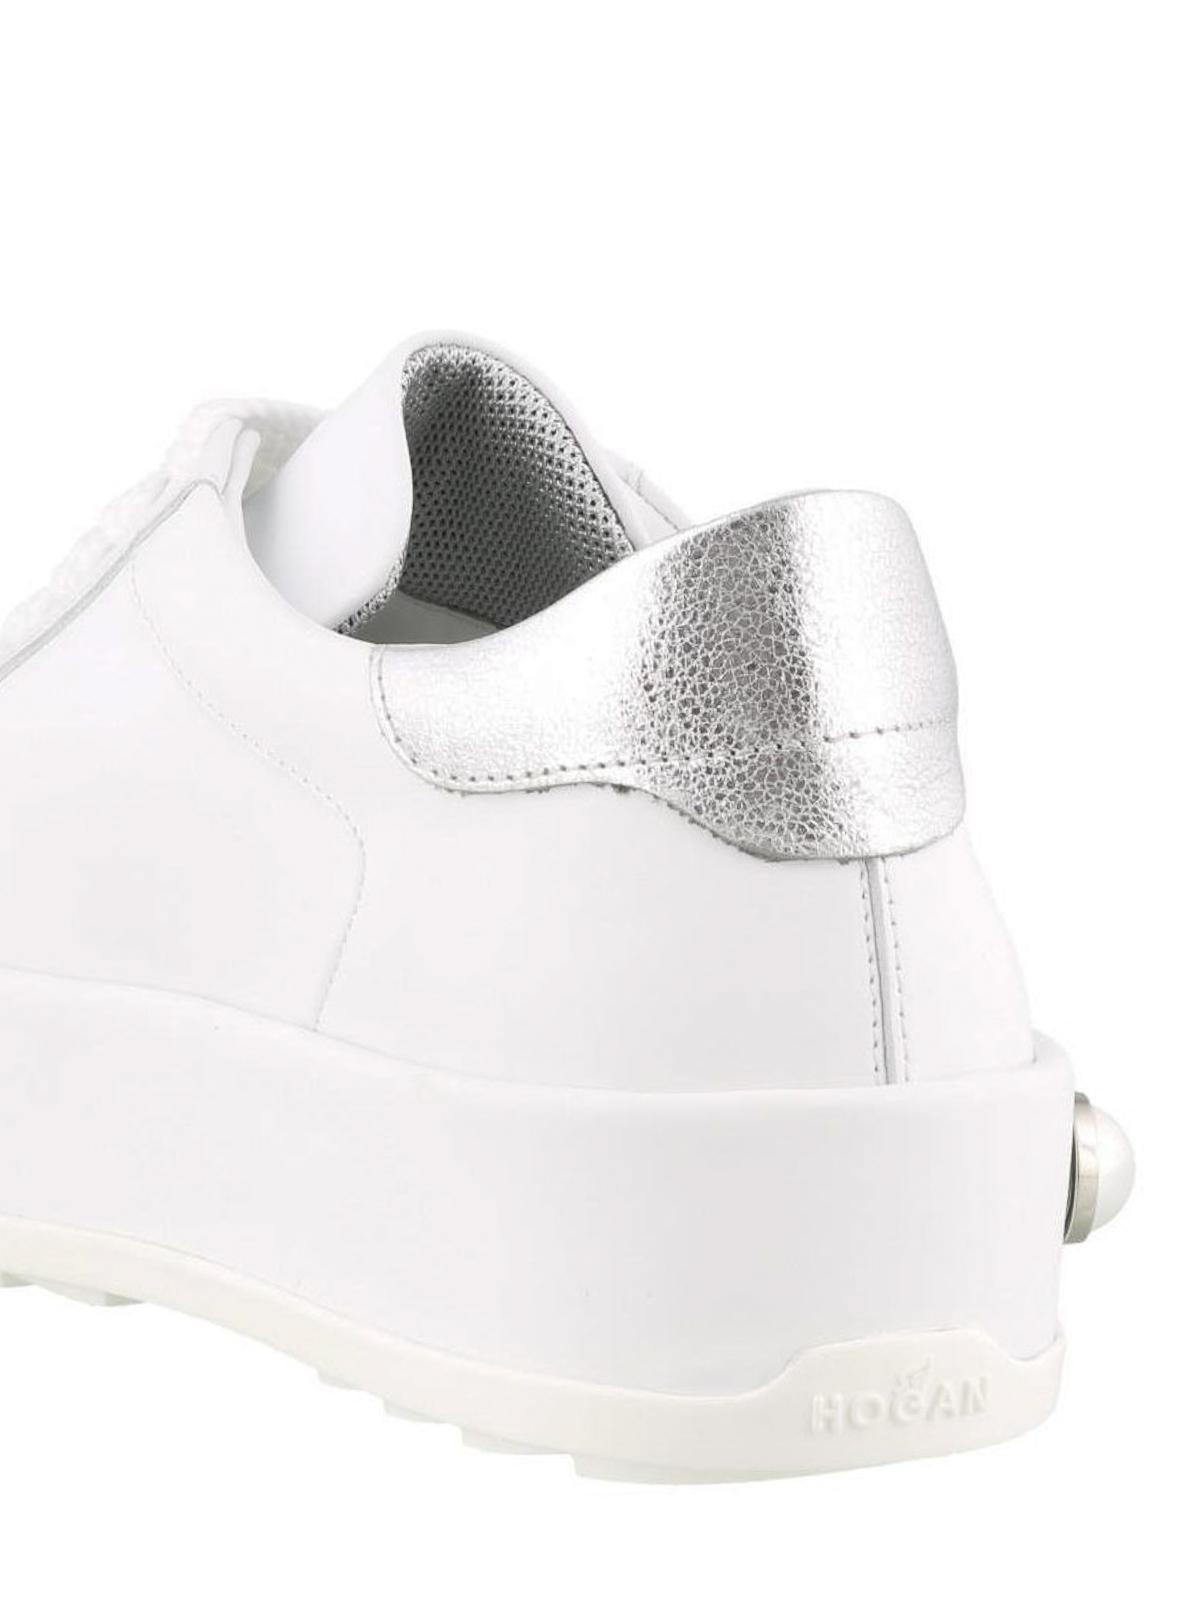 Trainers Hogan - Metallic detail H320 sneakers - HXW3800AG80JFD0351